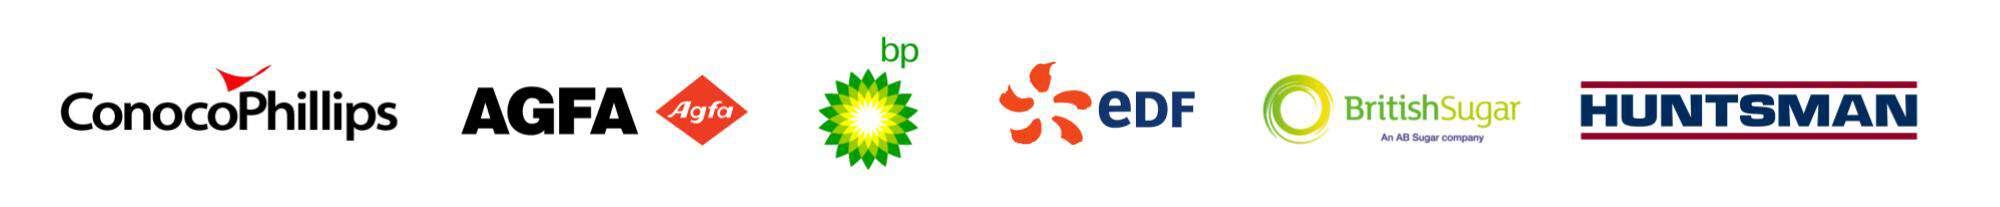 rms customer logos